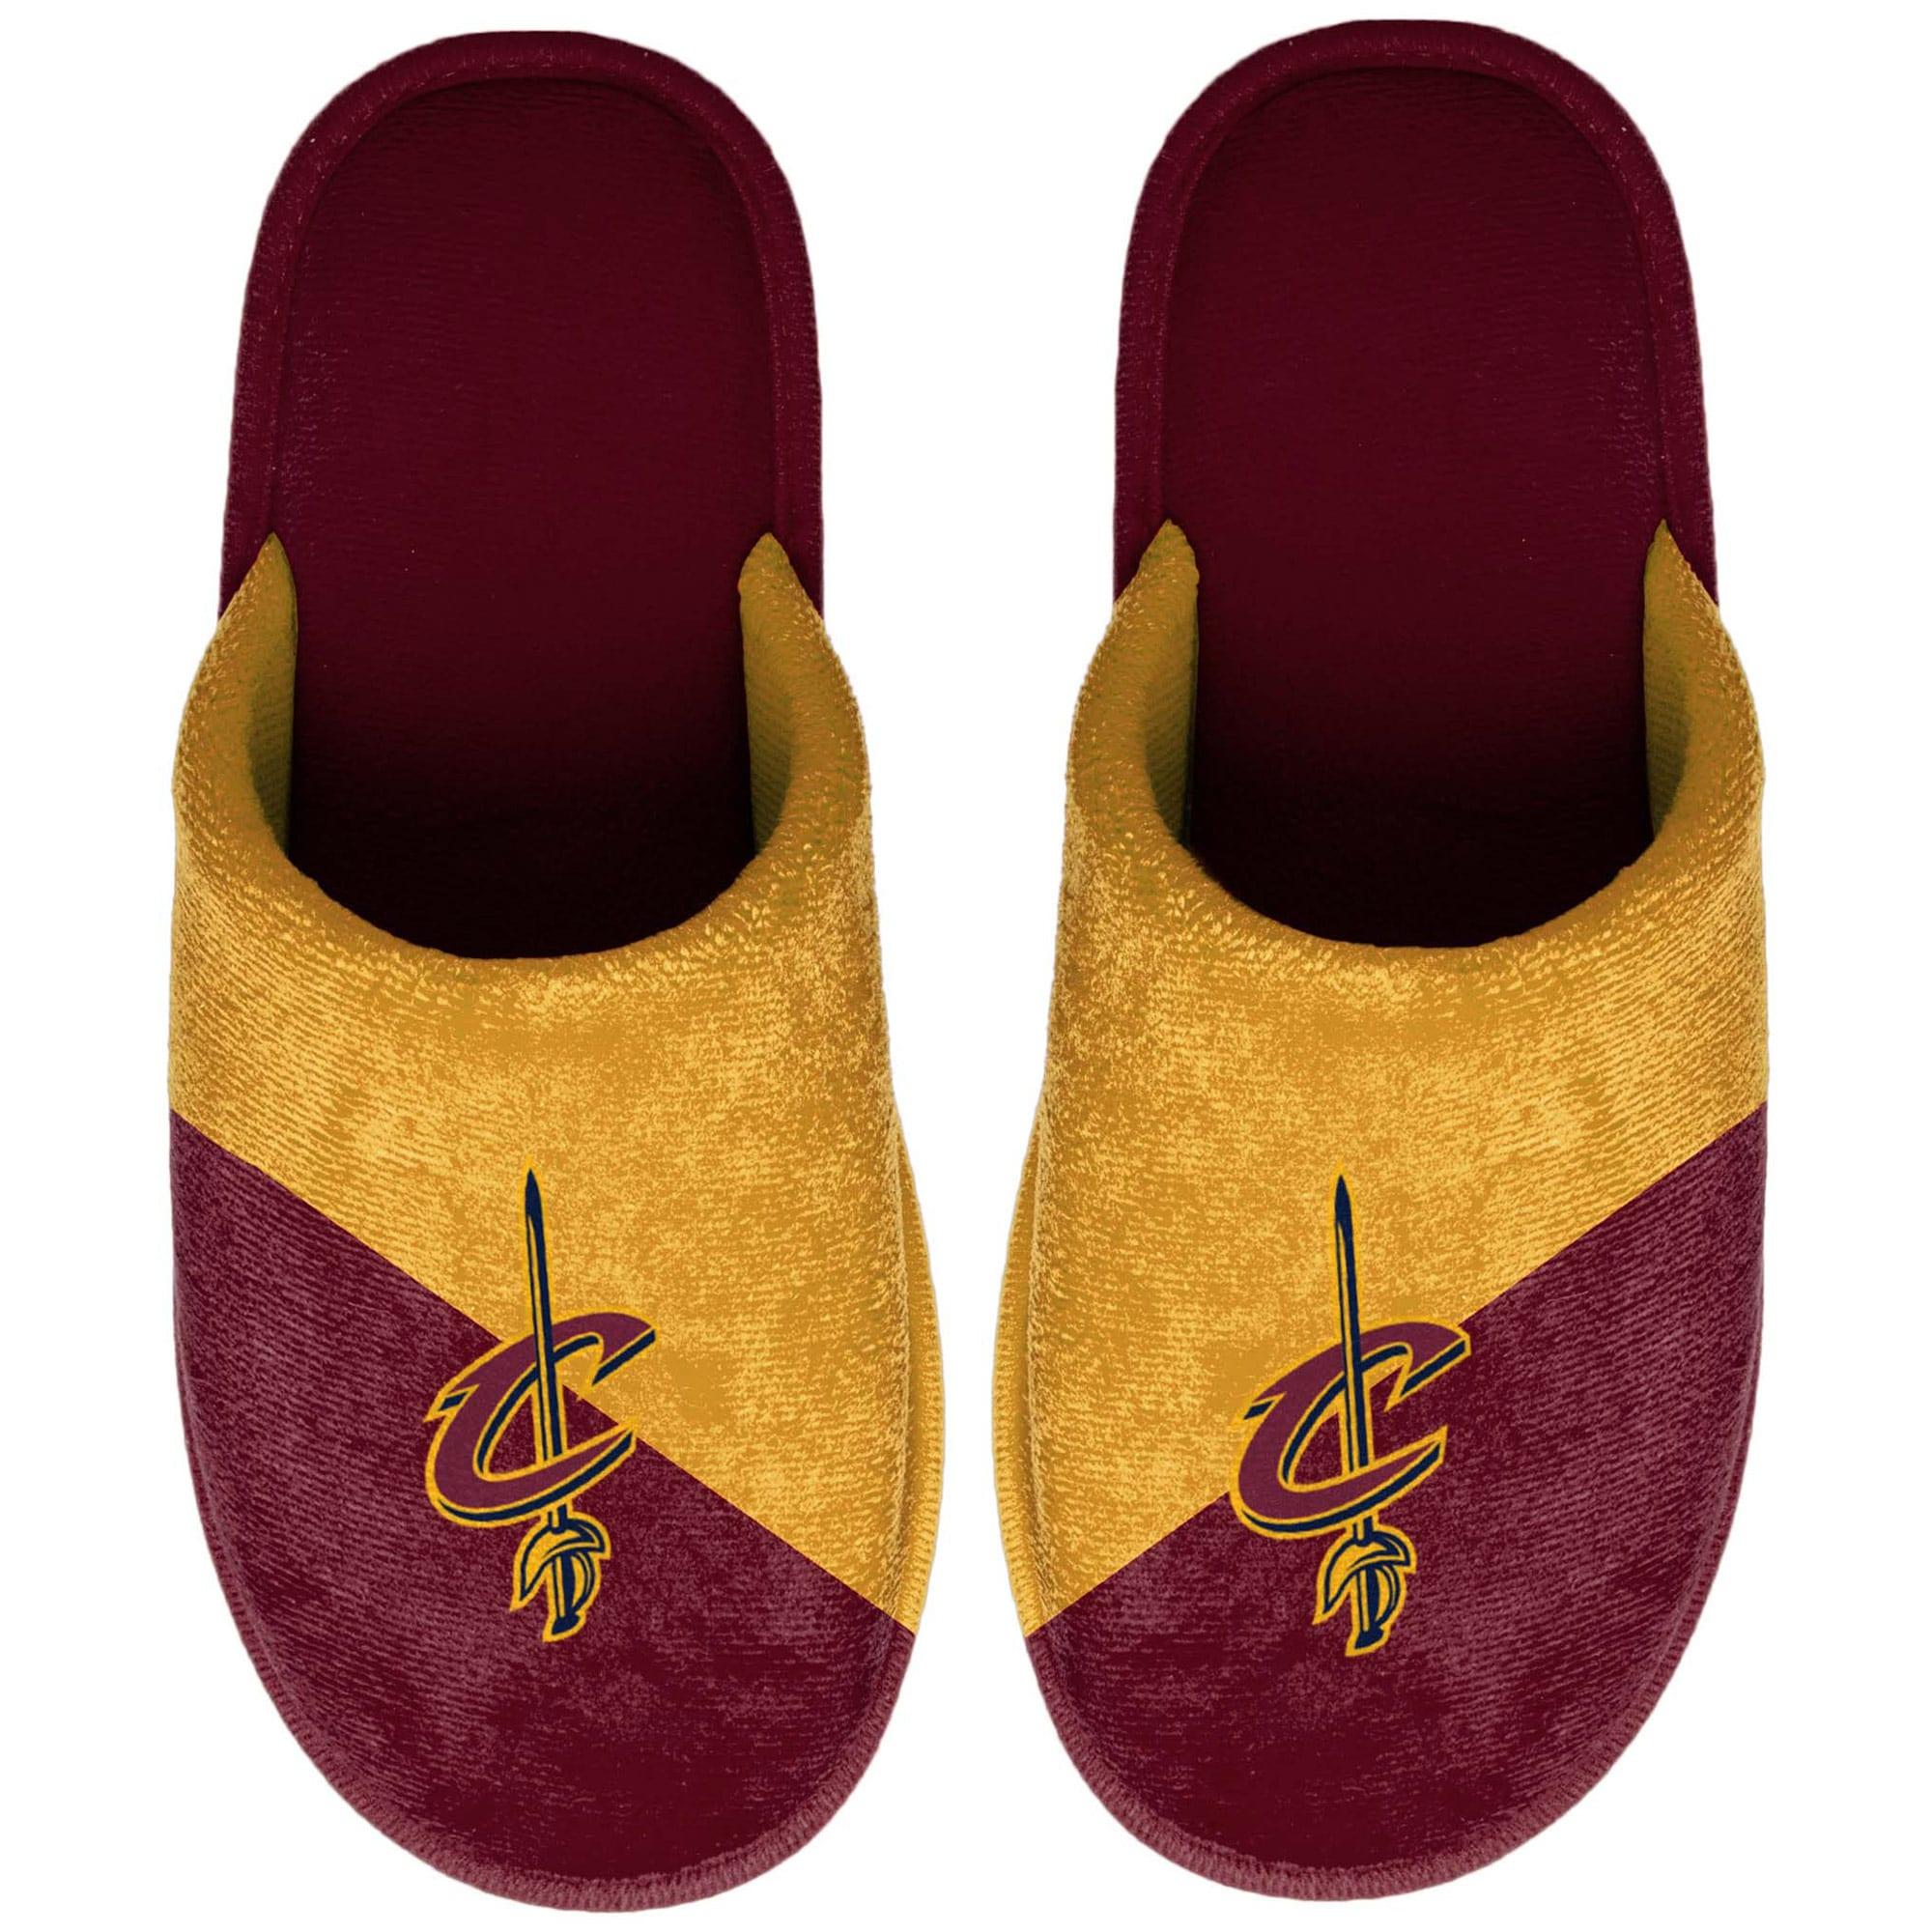 Cleveland Cavaliers Big Logo Scuff Slippers